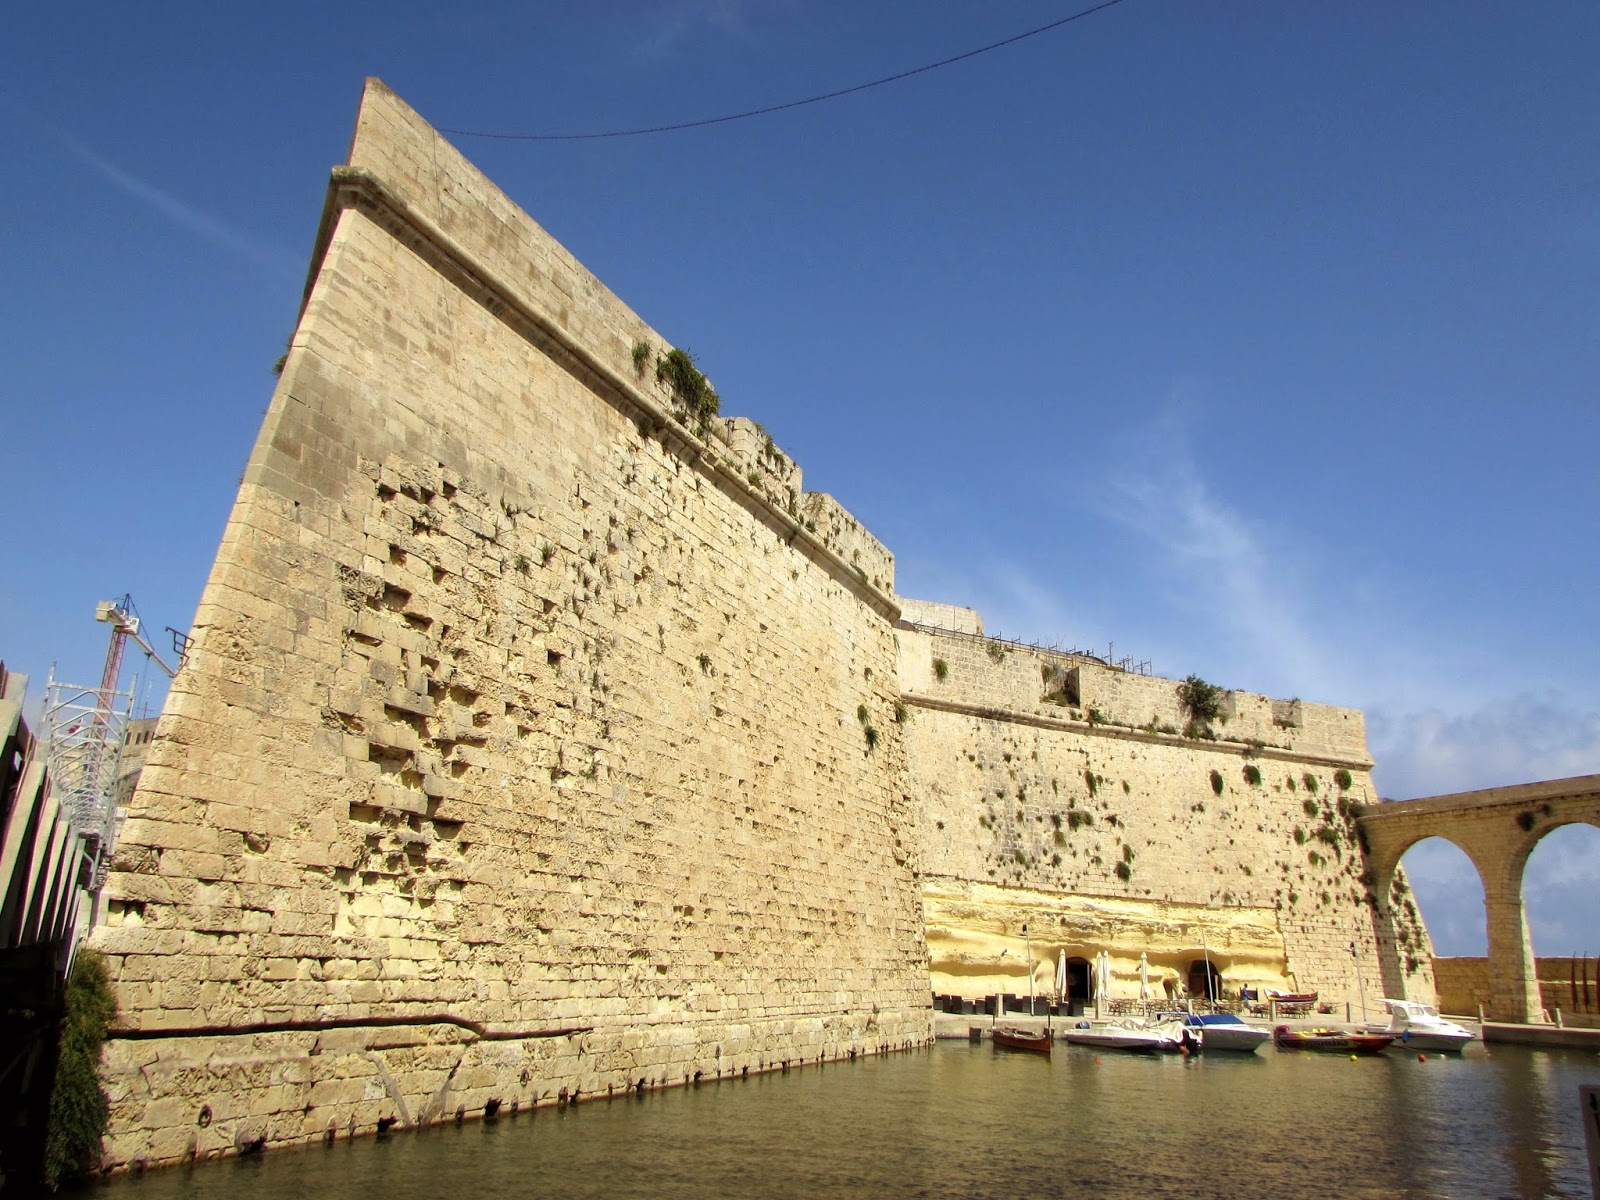 Malta. Malte. Il-Bet Valletta. La Valeta. Fuerte saint Angelo. Il-Birgu. Vittoriosa)